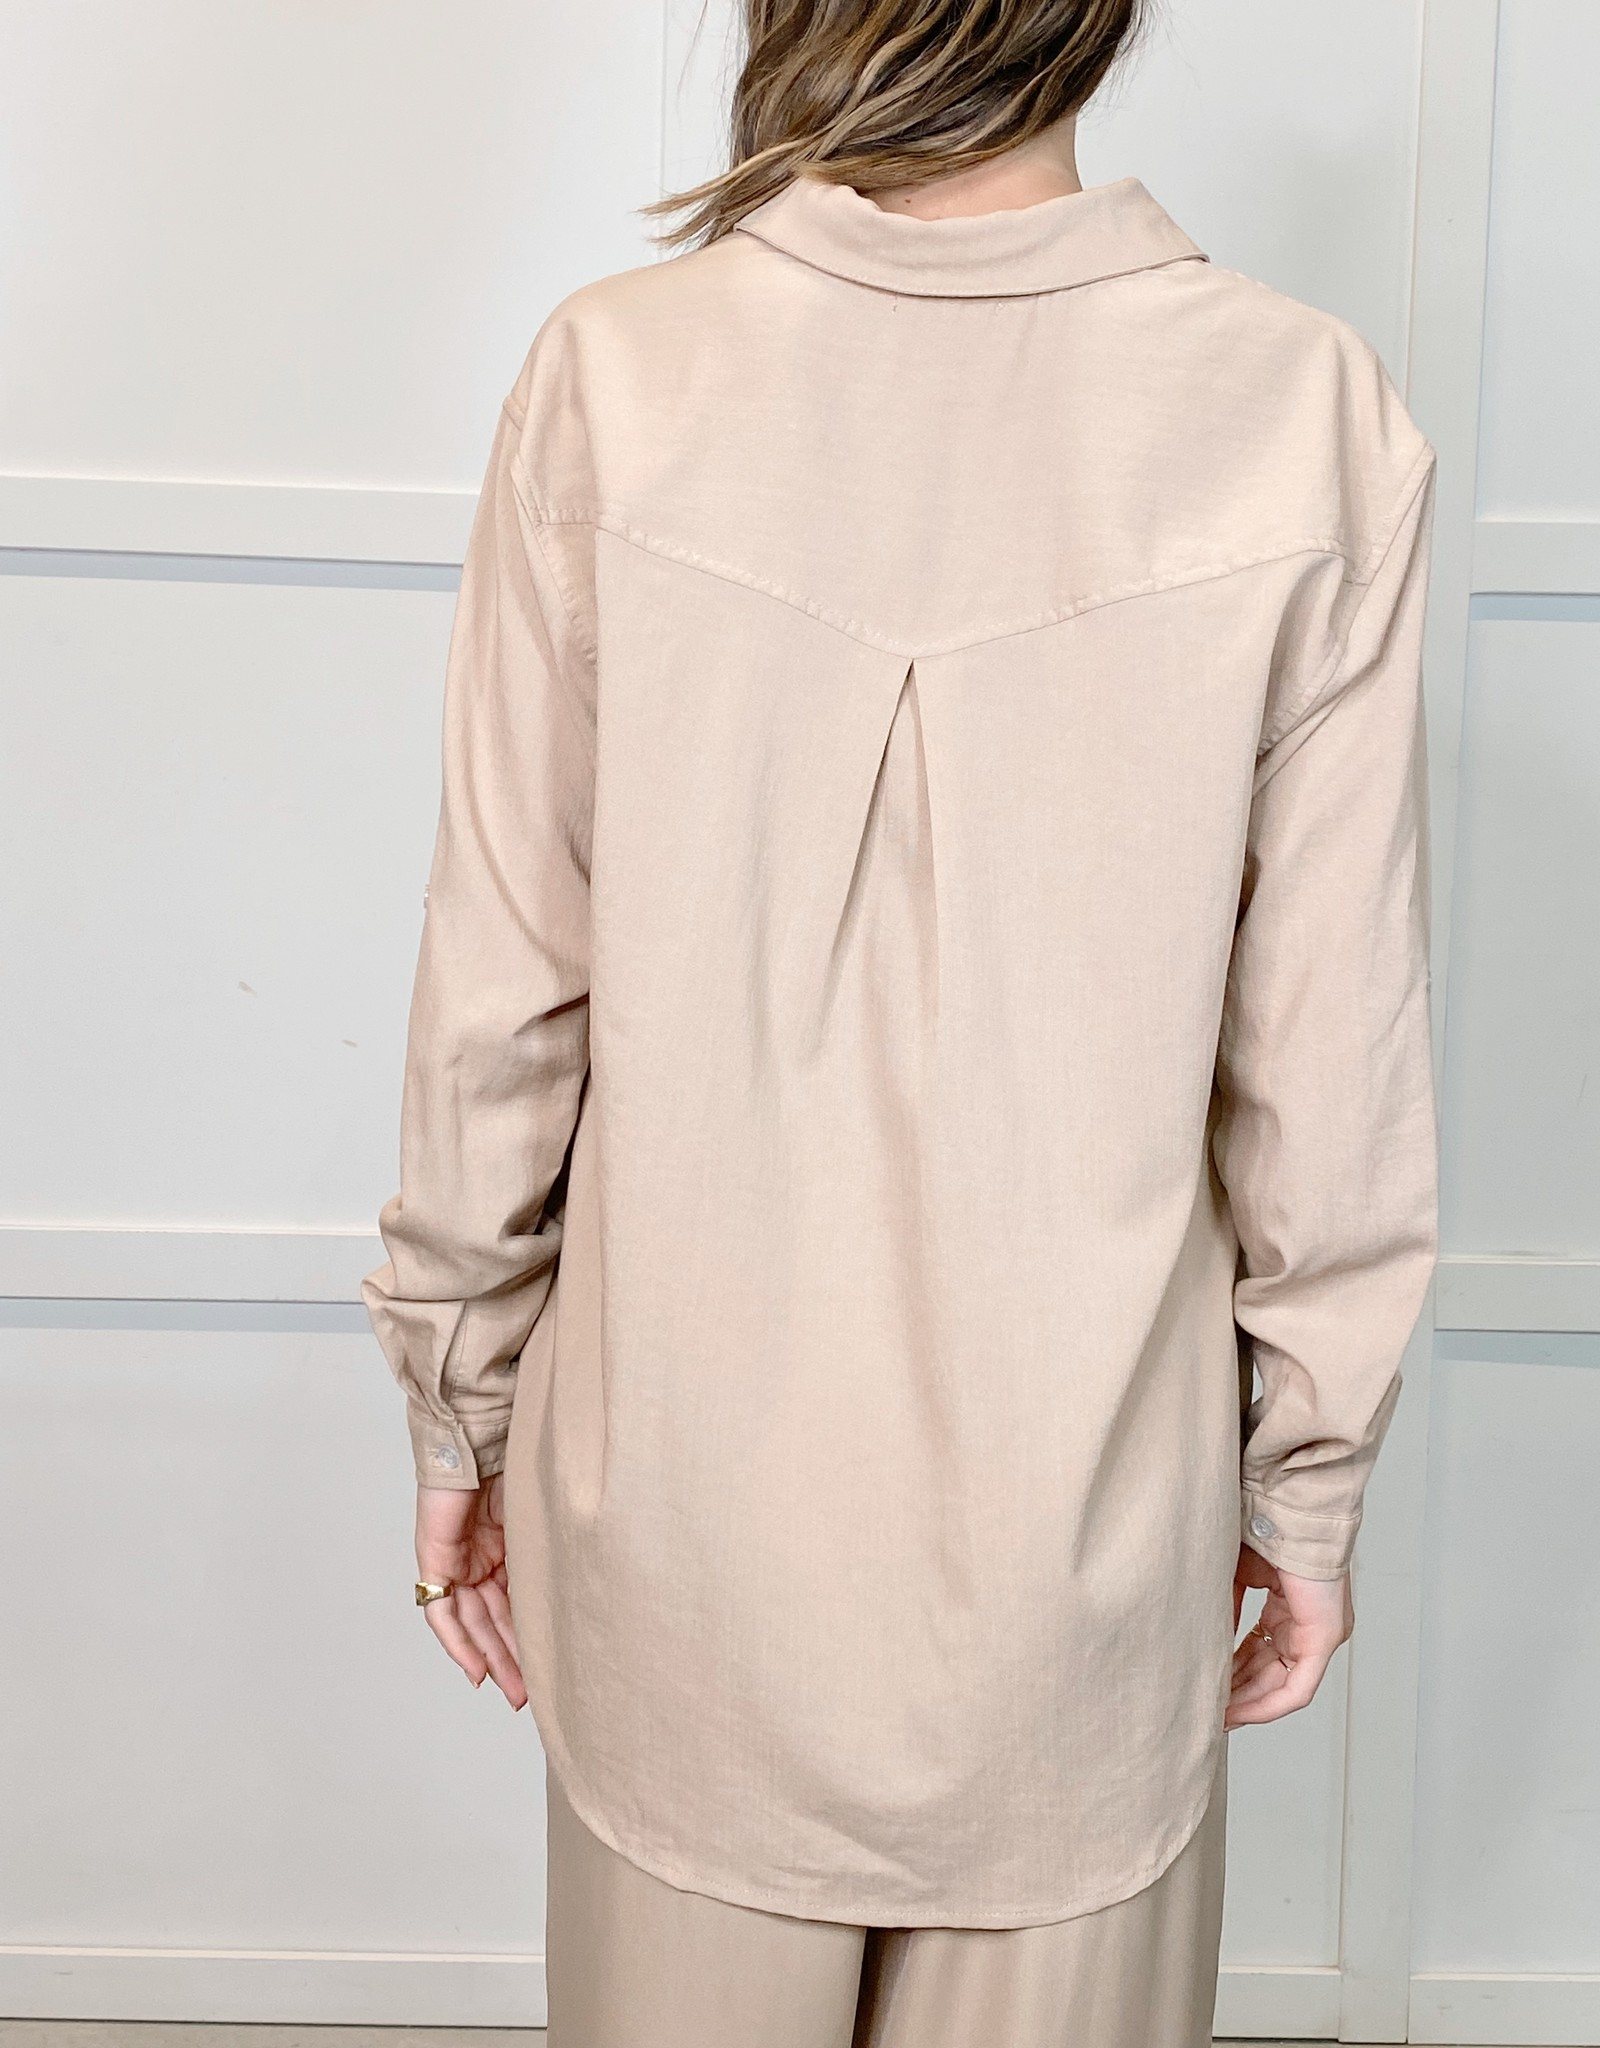 HUSH IDRA oversized blouse